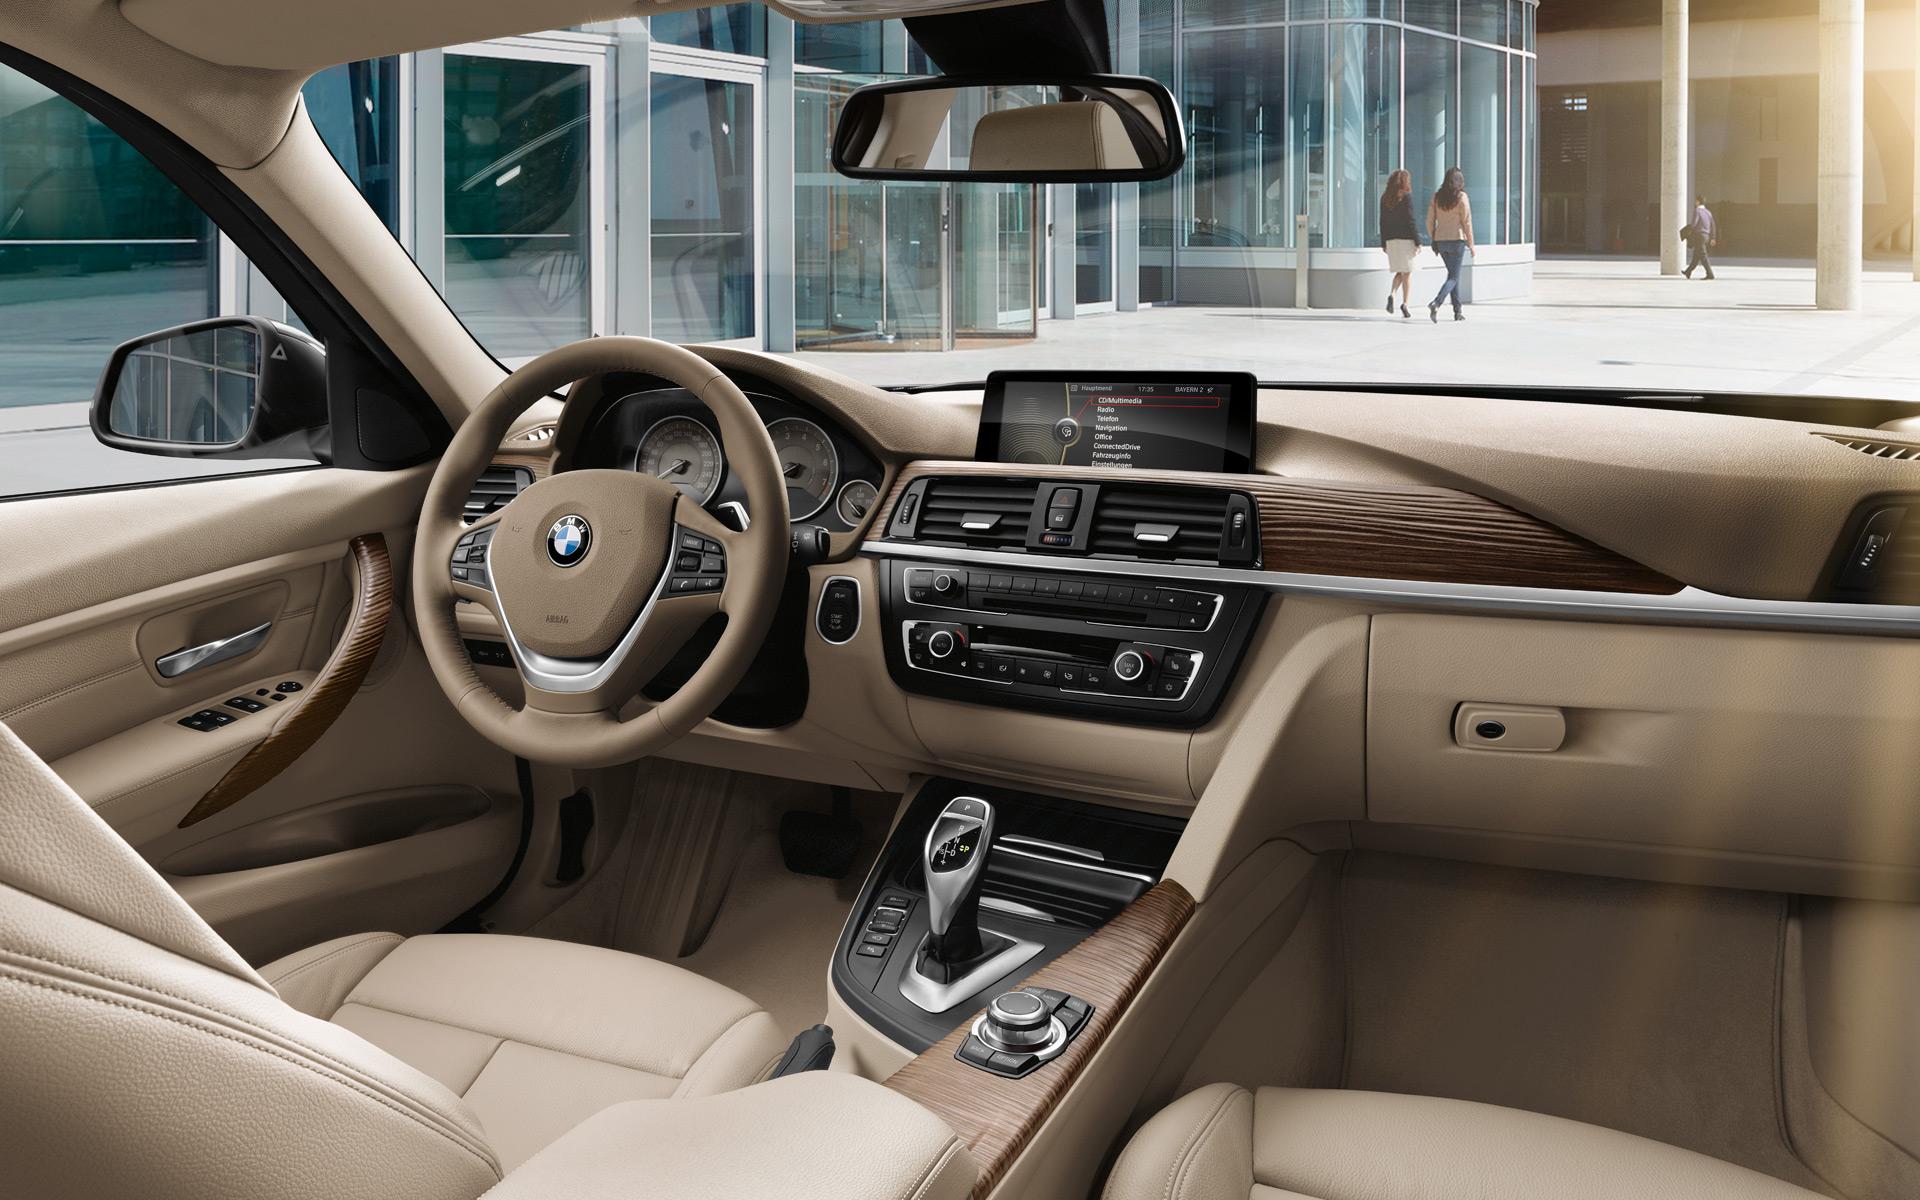 Bmw 3 Series F30 Interior Car Body Design